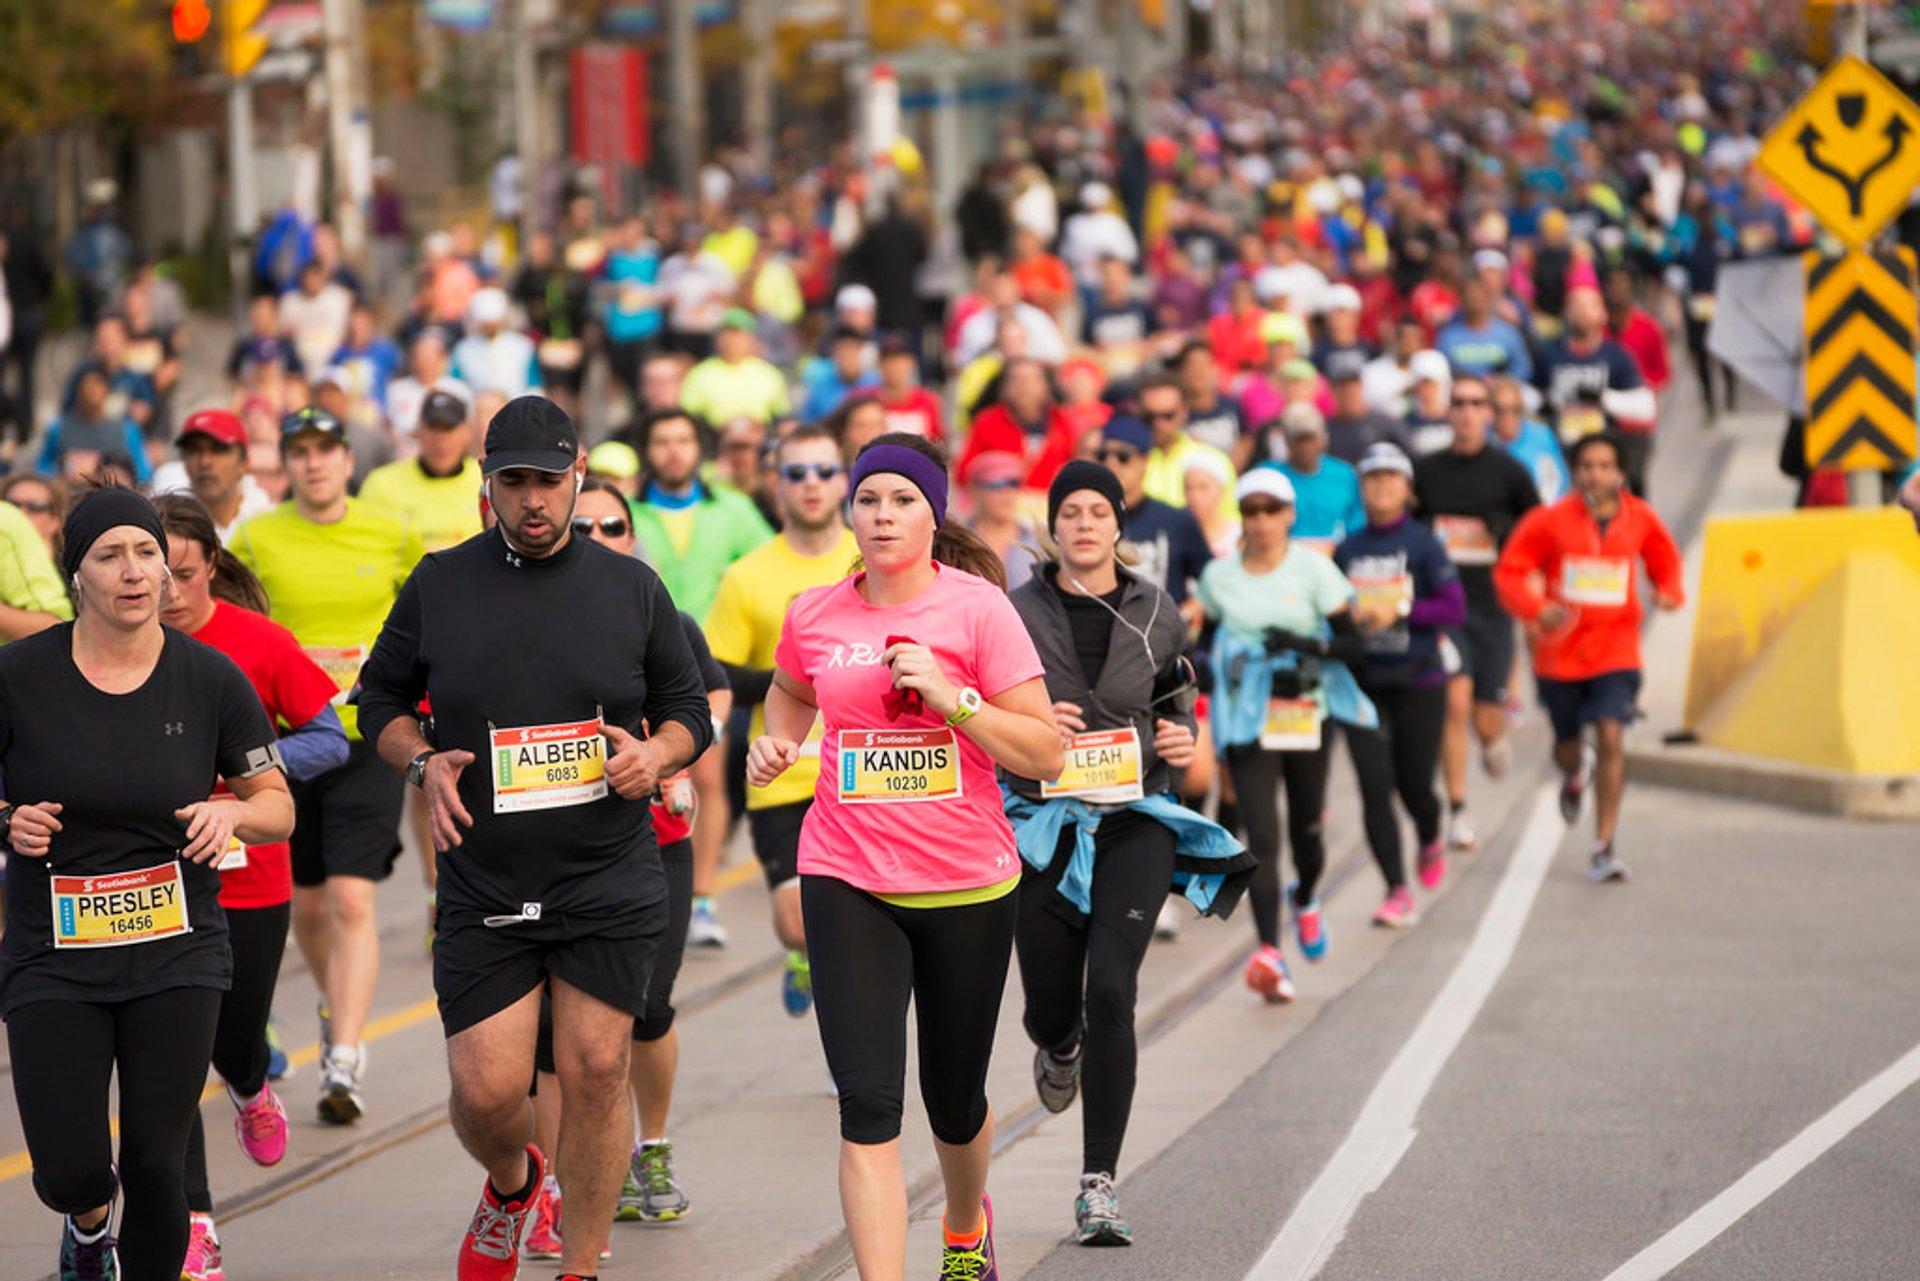 Toronto Waterfront Marathon in Toronto 2020 - Best Time